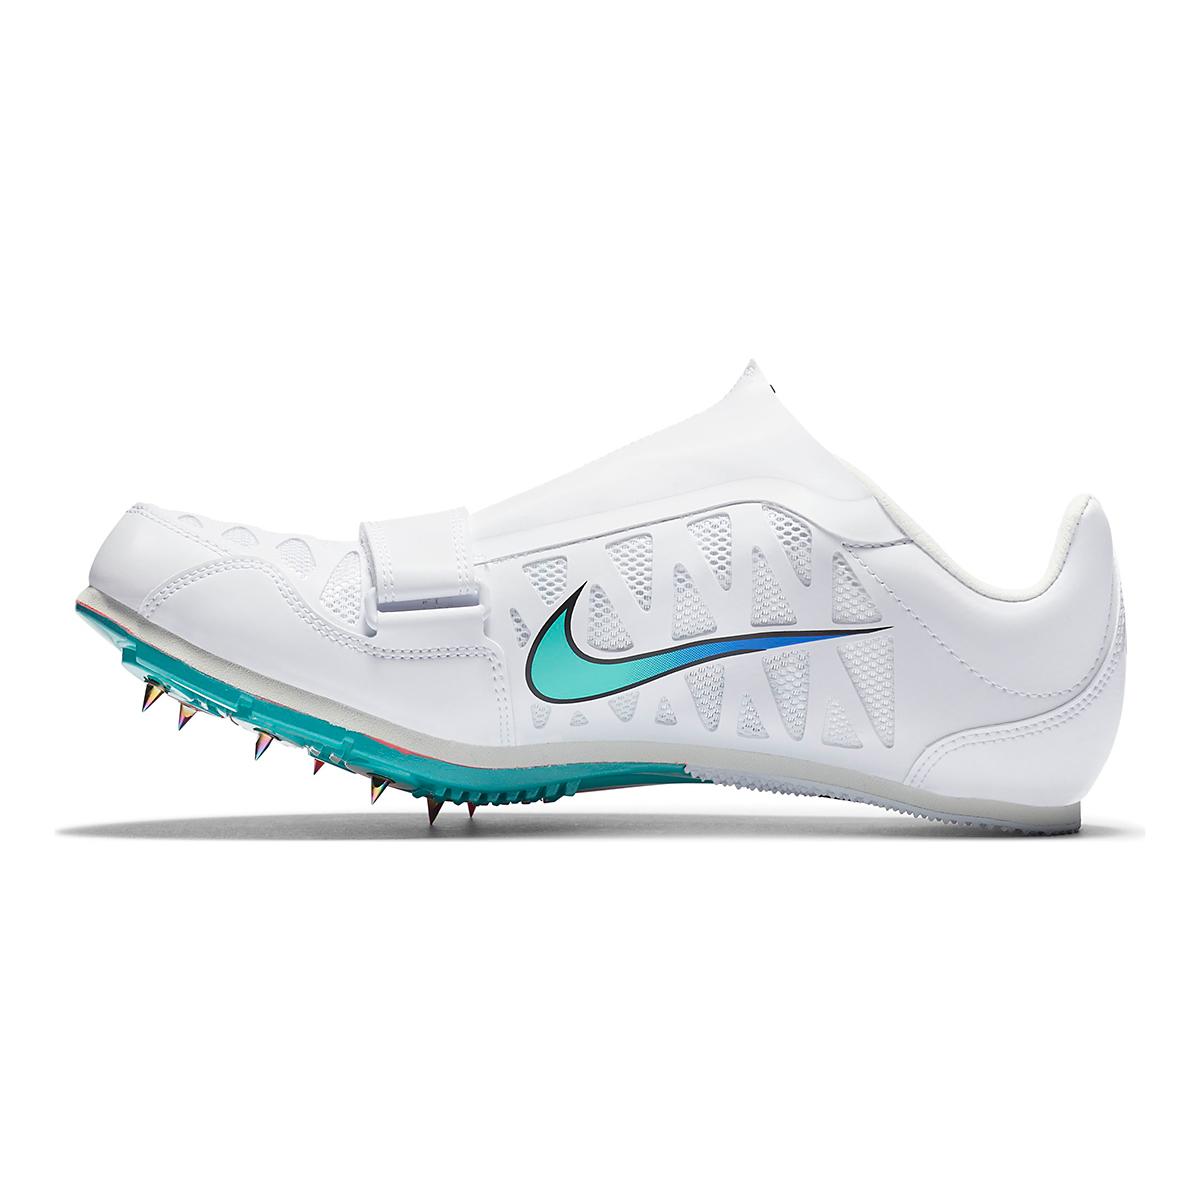 Nike Zoom Long Jump 4 Track Spikes - Color: White/Flash Crimson - Size: M4/W5.5 - Width: Regular, White/Flash Crimson, large, image 2